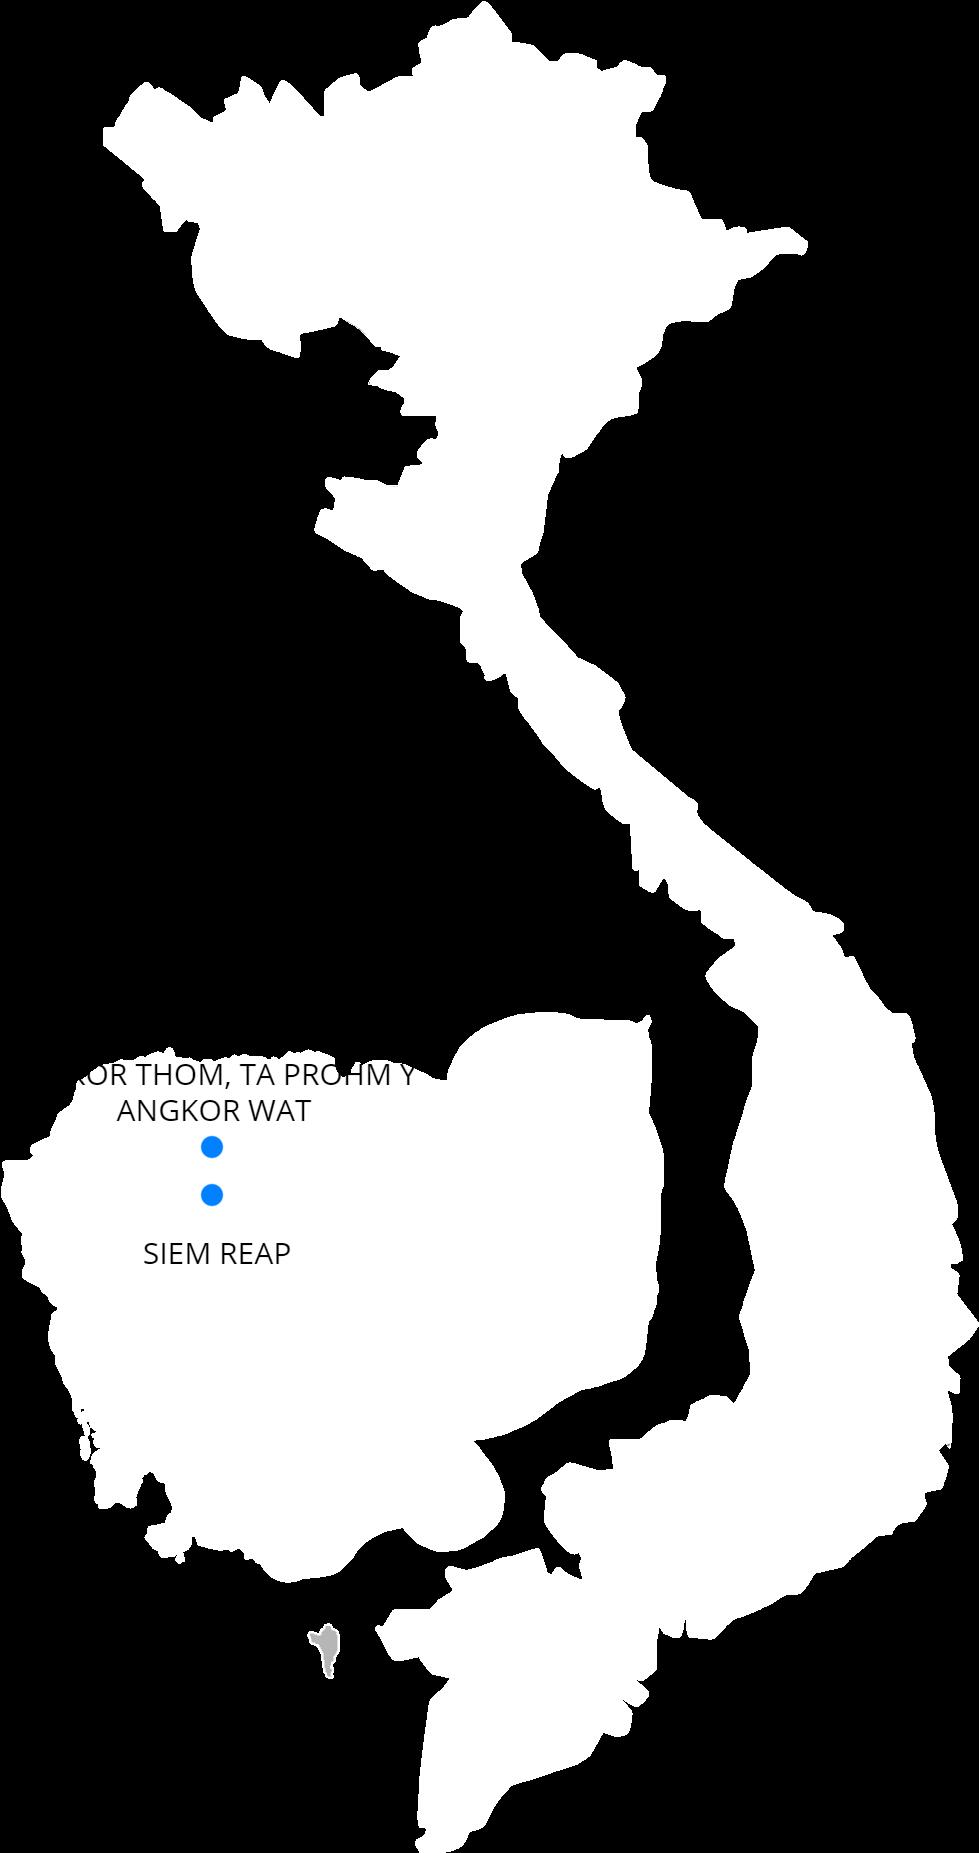 Download Siem Reap Angkorwat Angkorthom Taprohm - Blank Outline Of